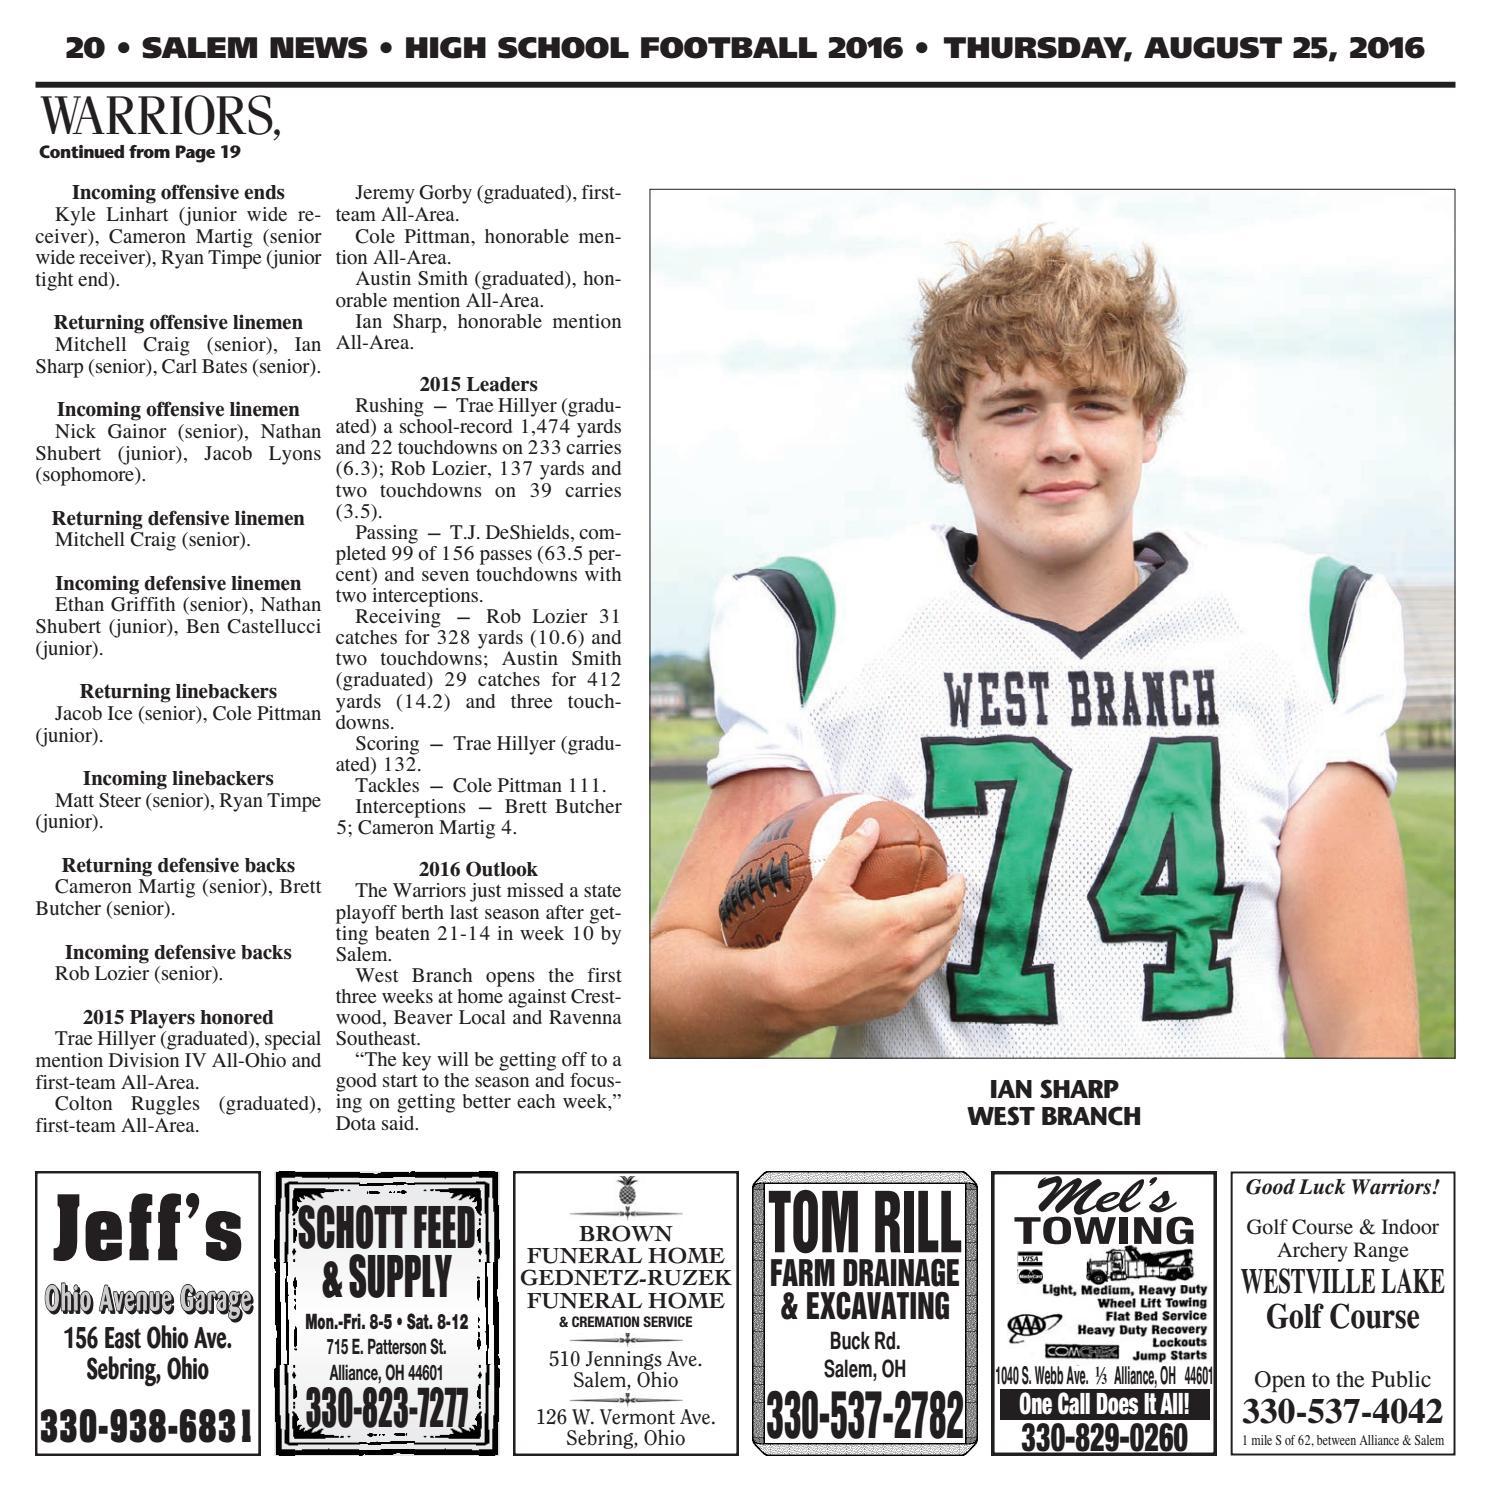 Salem News - Football 2016 by Morning Journal - issuu